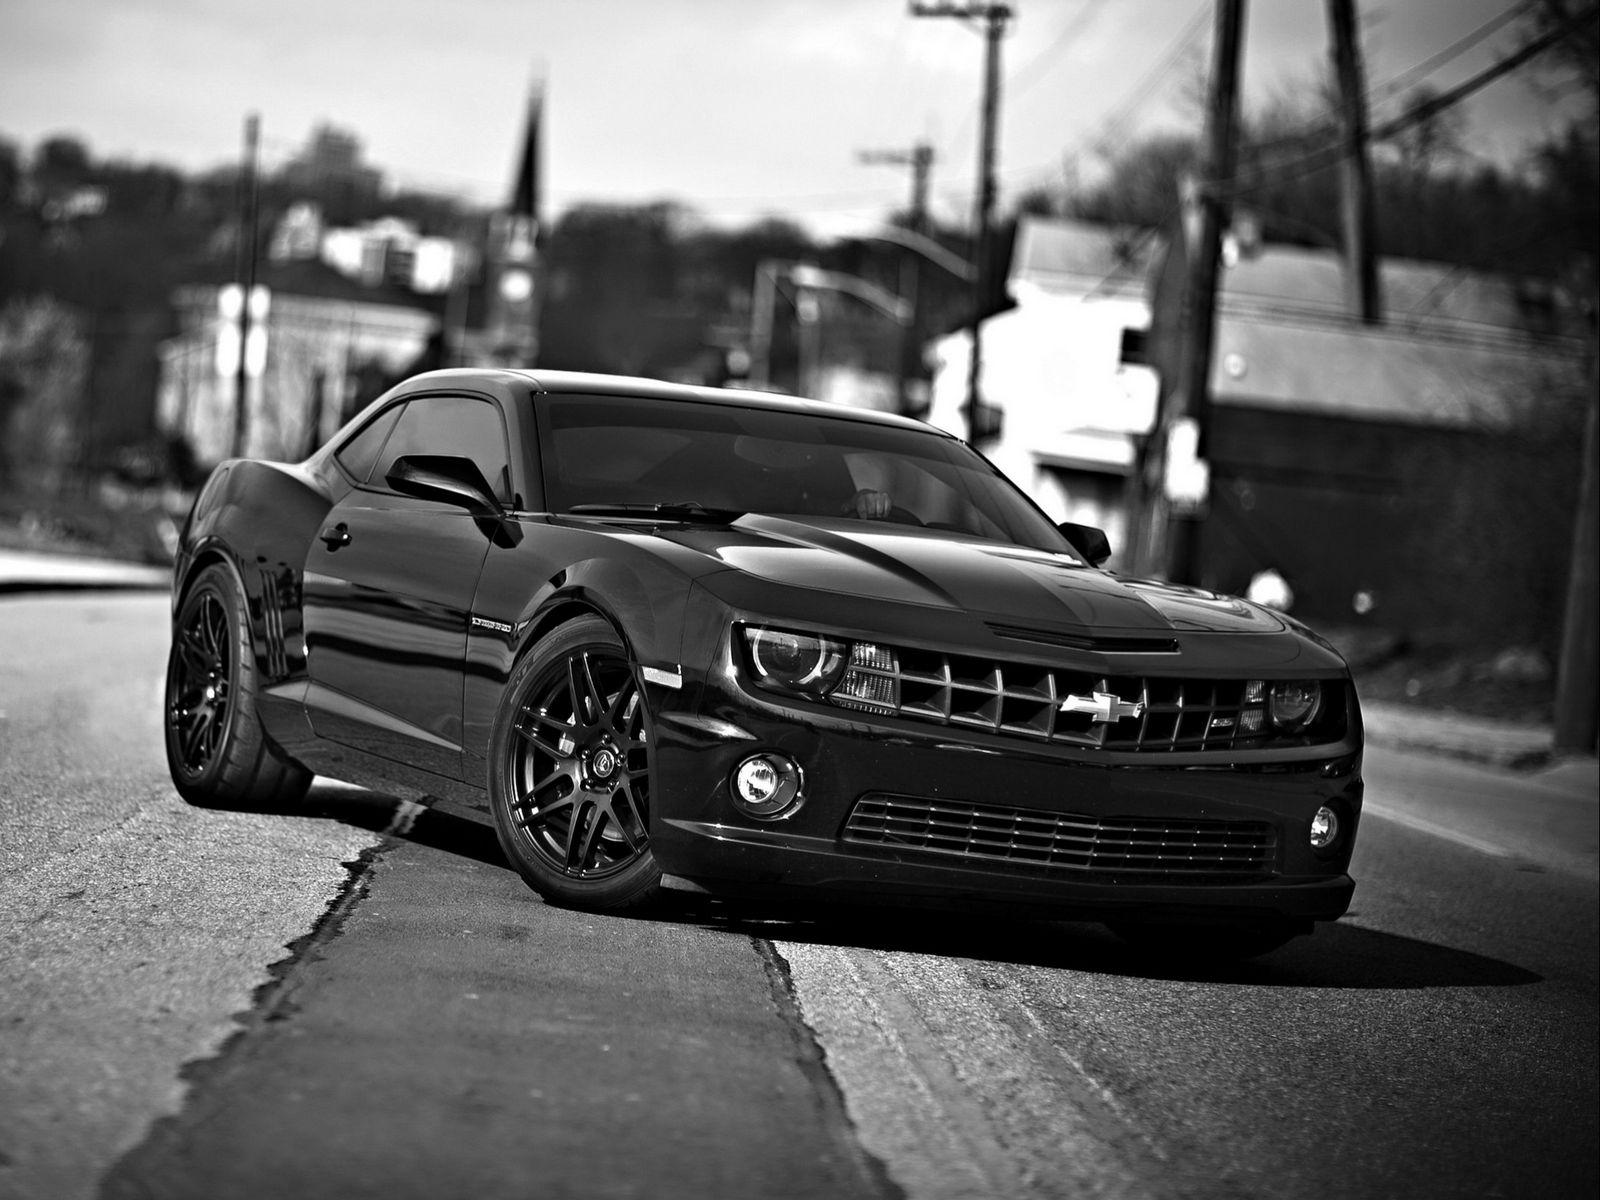 1600x1200 Wallpaper chevrolet camaro, chevrolet, cars, front view, black white